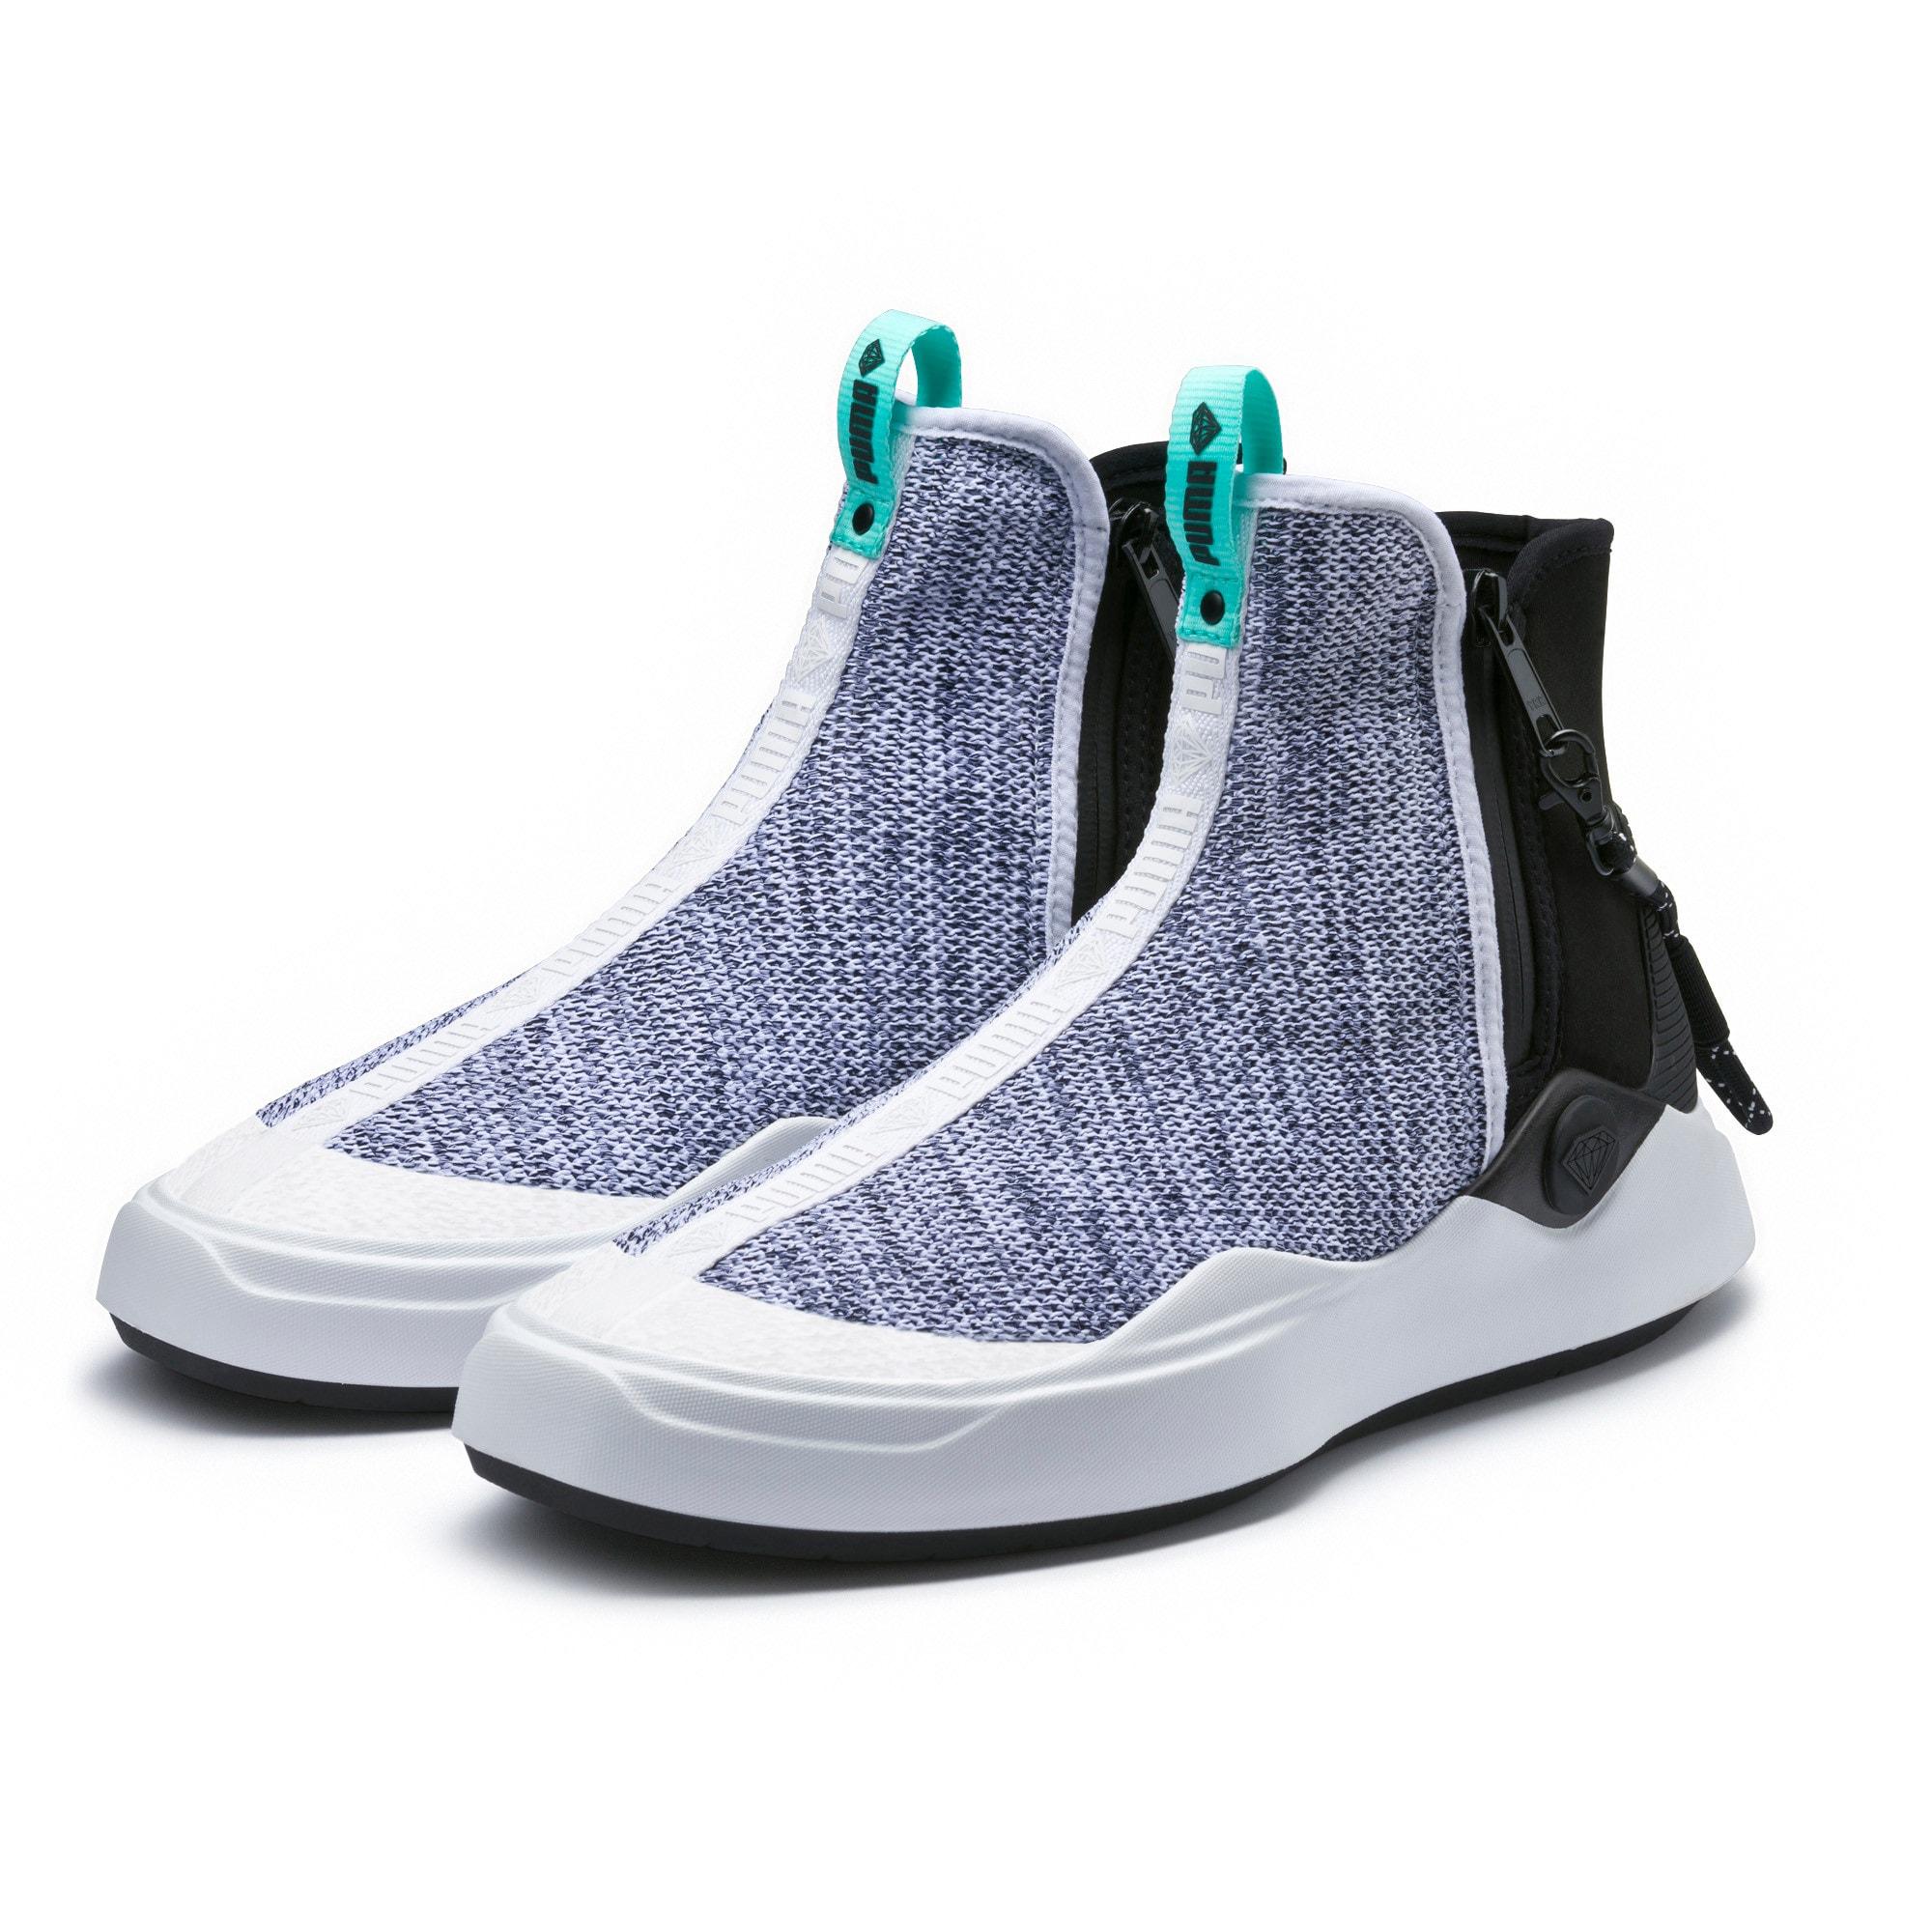 Thumbnail 2 of PUMA x DIAMOND Abyss Knit Sneakers, Puma White-Puma Black, medium